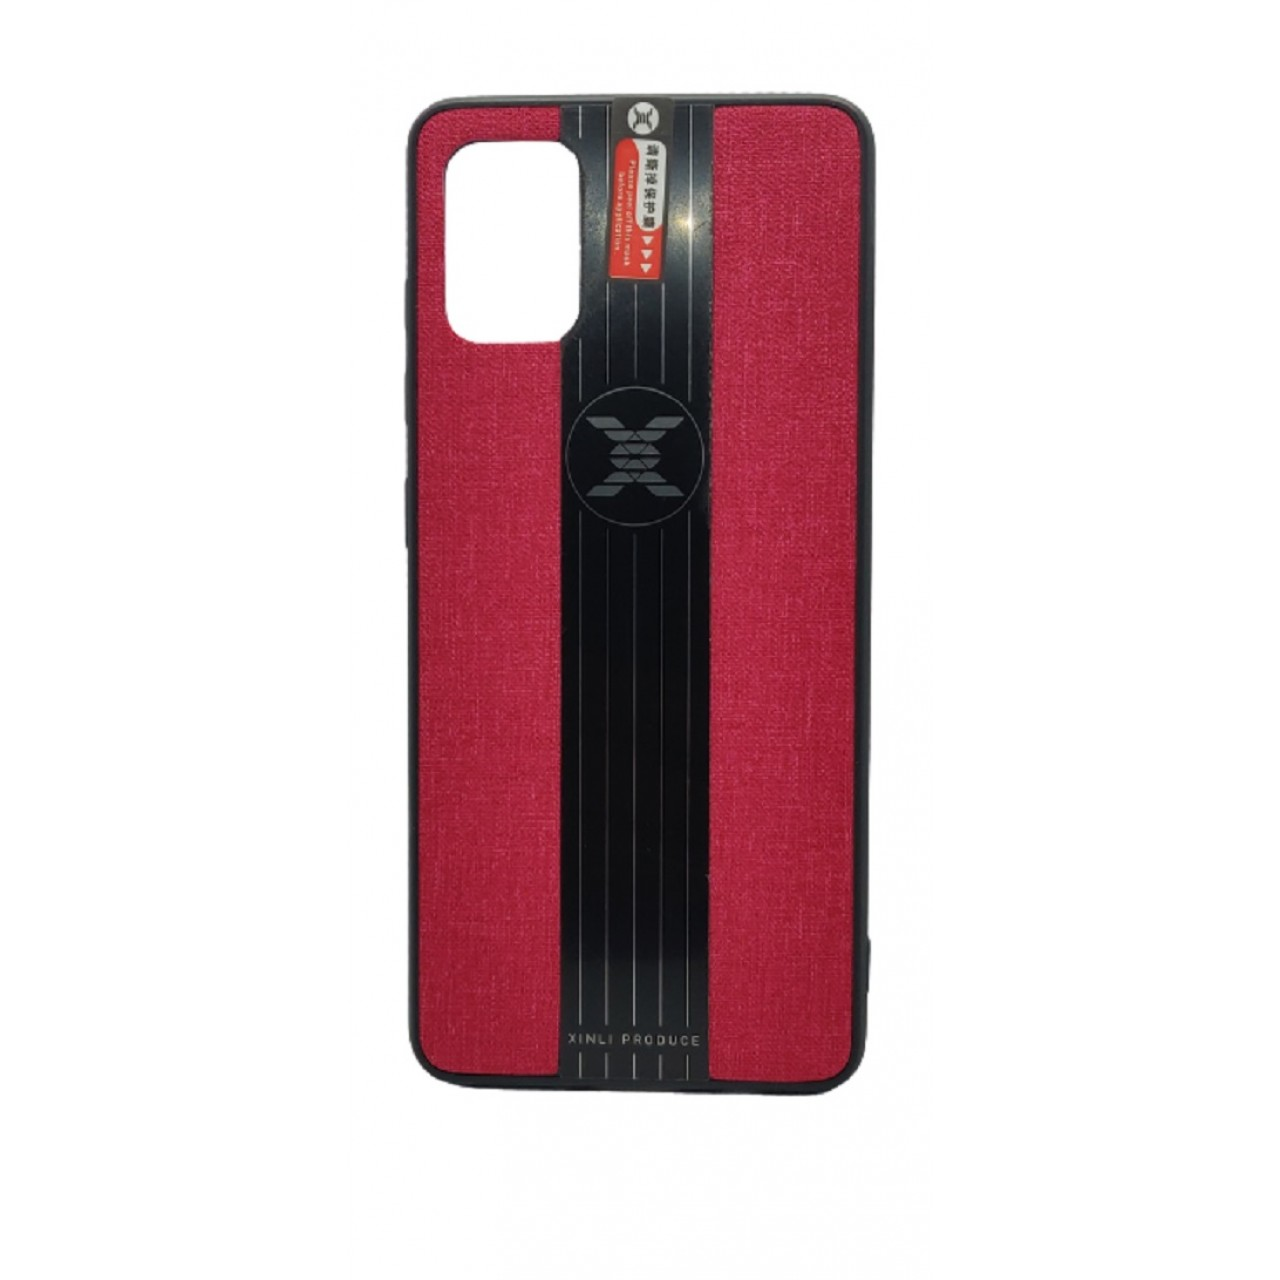 Back Case Cloth Pattern with ring for Samsung A51 Red - Θήκη προστασίας με δαχτυλίδι στην πλάτη Κόκκινη - OEM